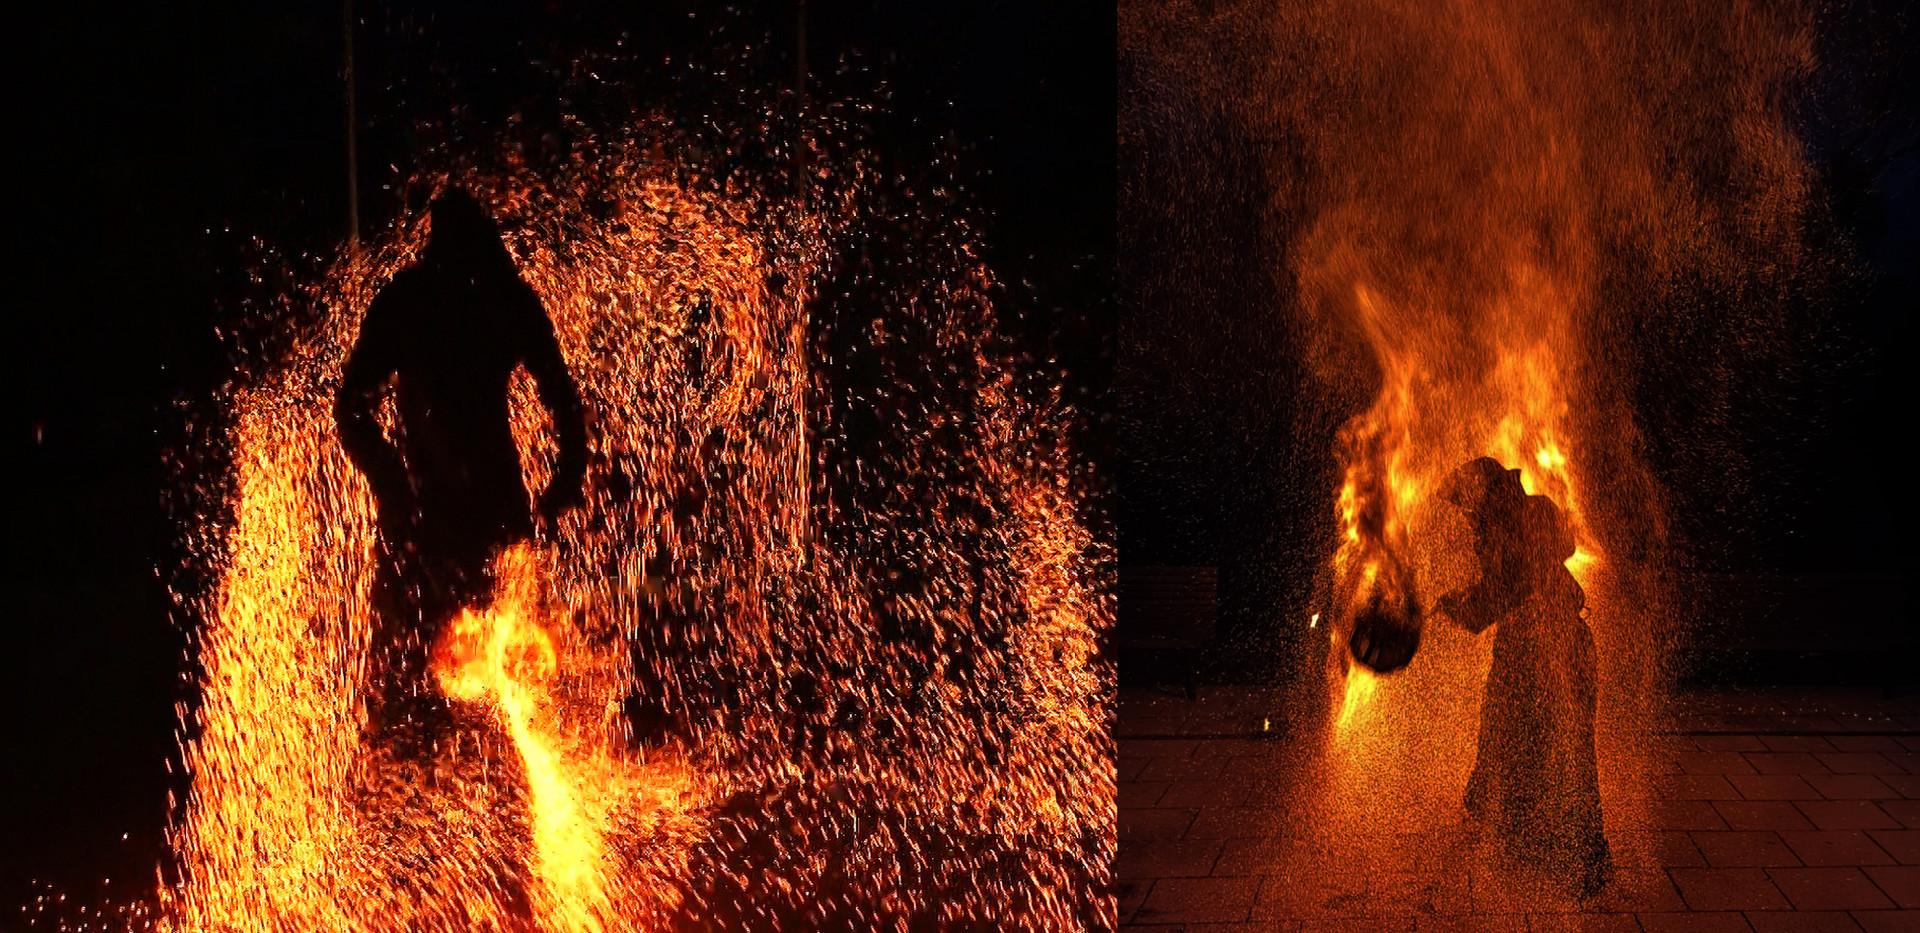 Kohlefunken Feuer